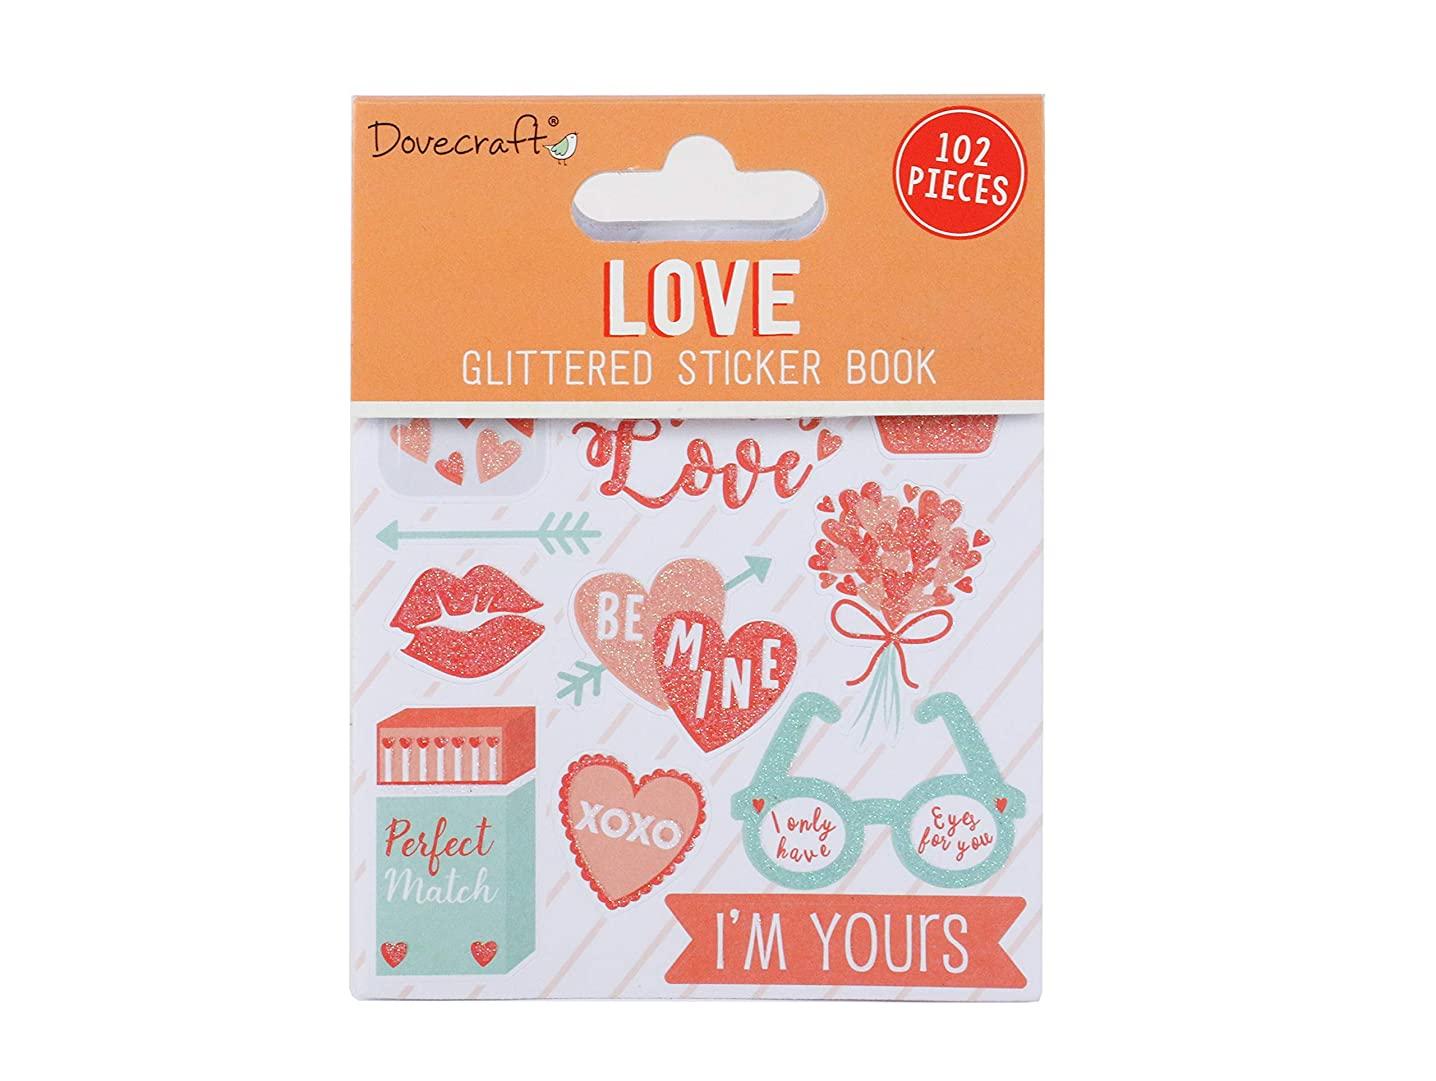 Dovecraft Paper Glitter Self Adhesive Card Craft Sticker Book - Love